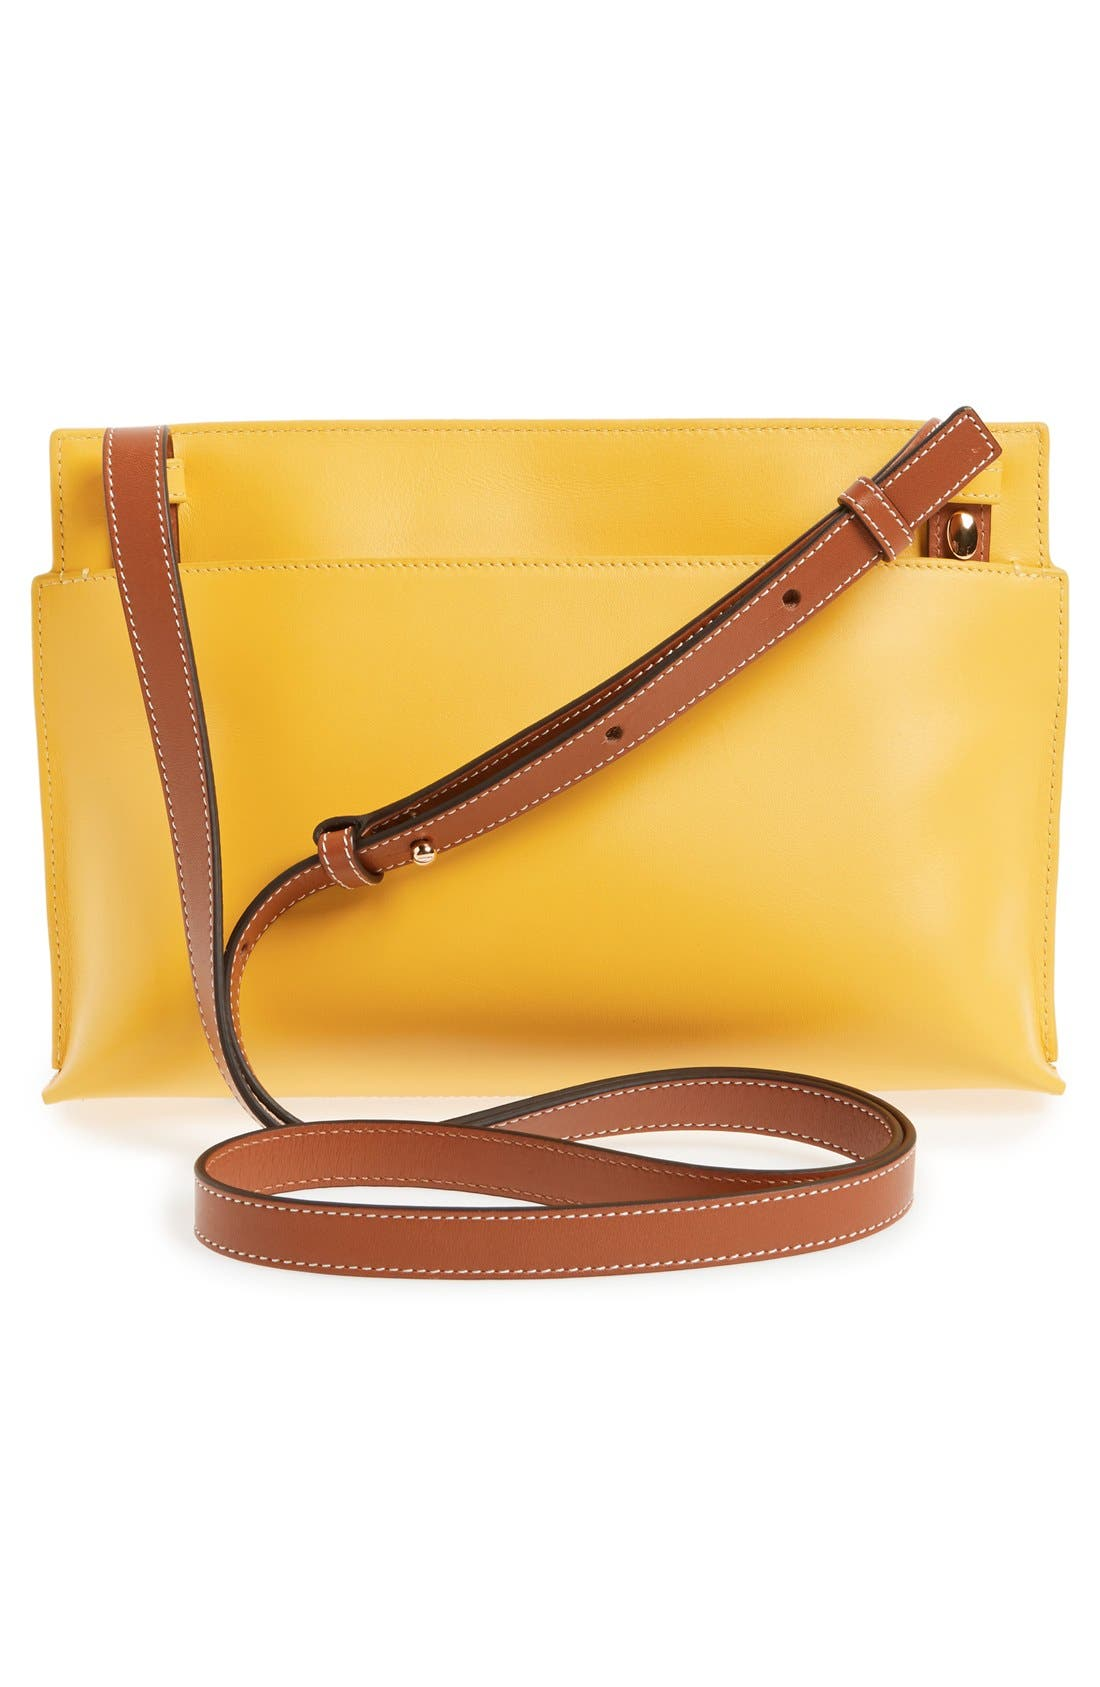 Alternate Image 3  - Loewe 'Fiore' Marquetry Calfskin Leather Crossbody Clutch